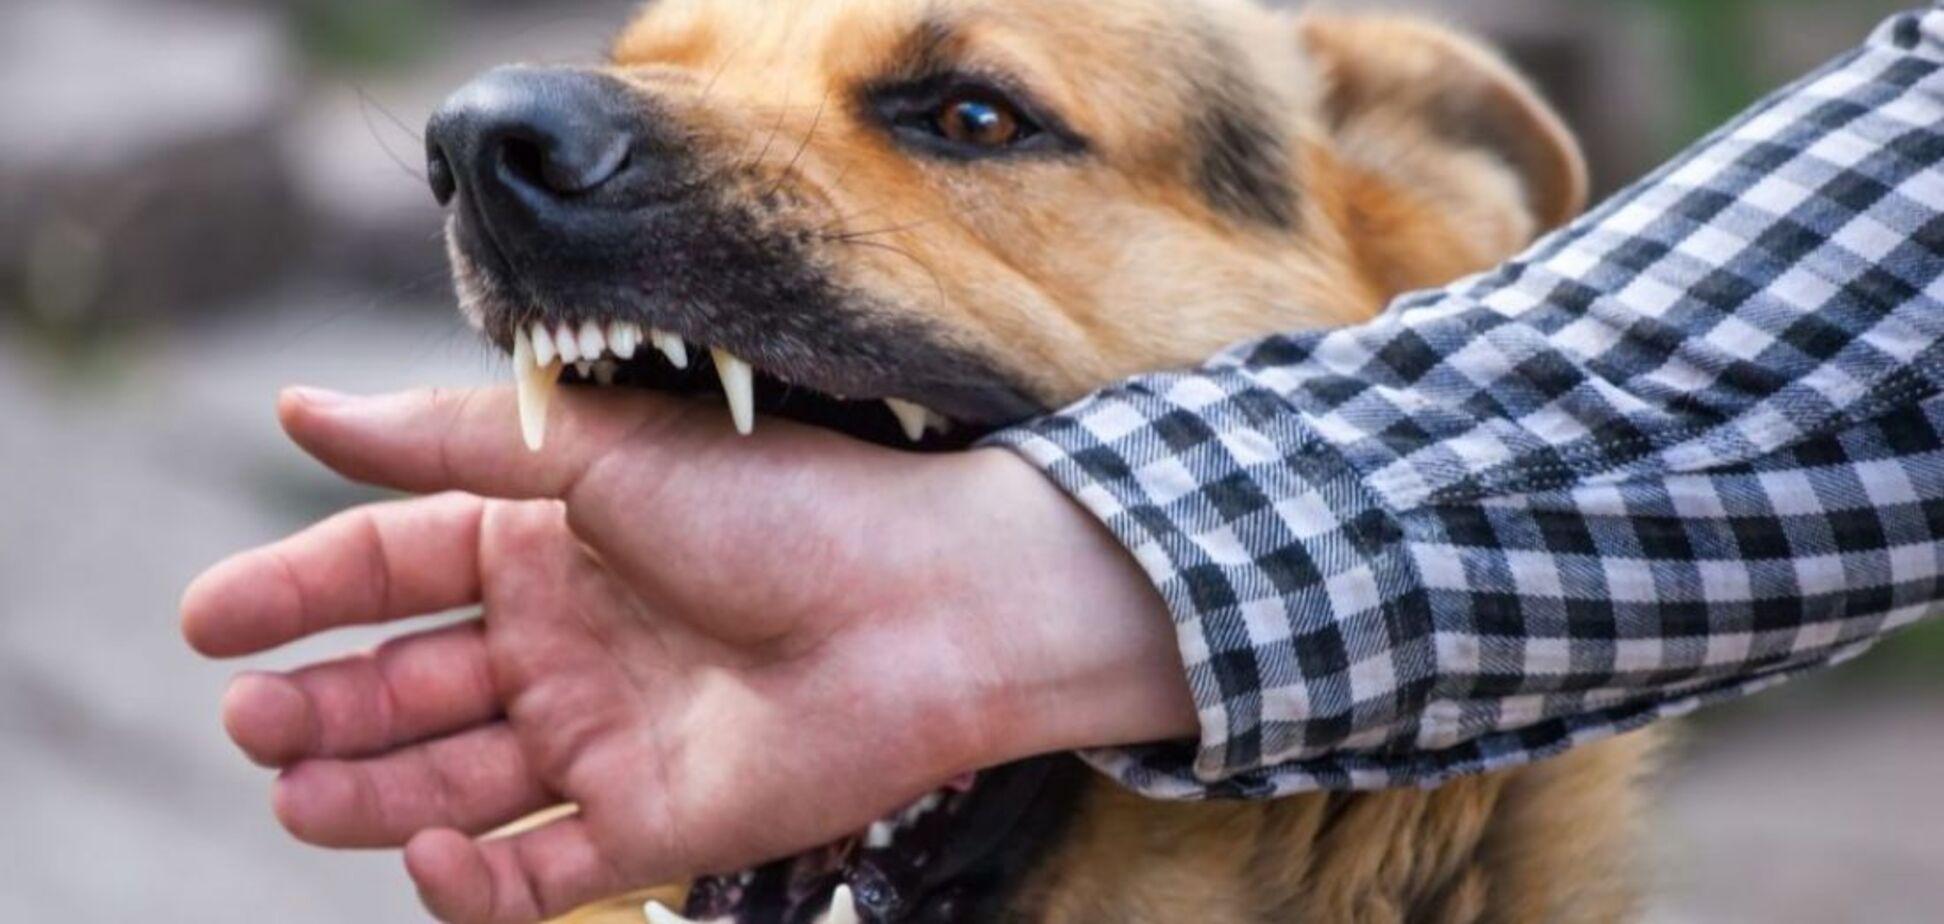 В Днепре собака посреди улицы разорвала руку ребенку